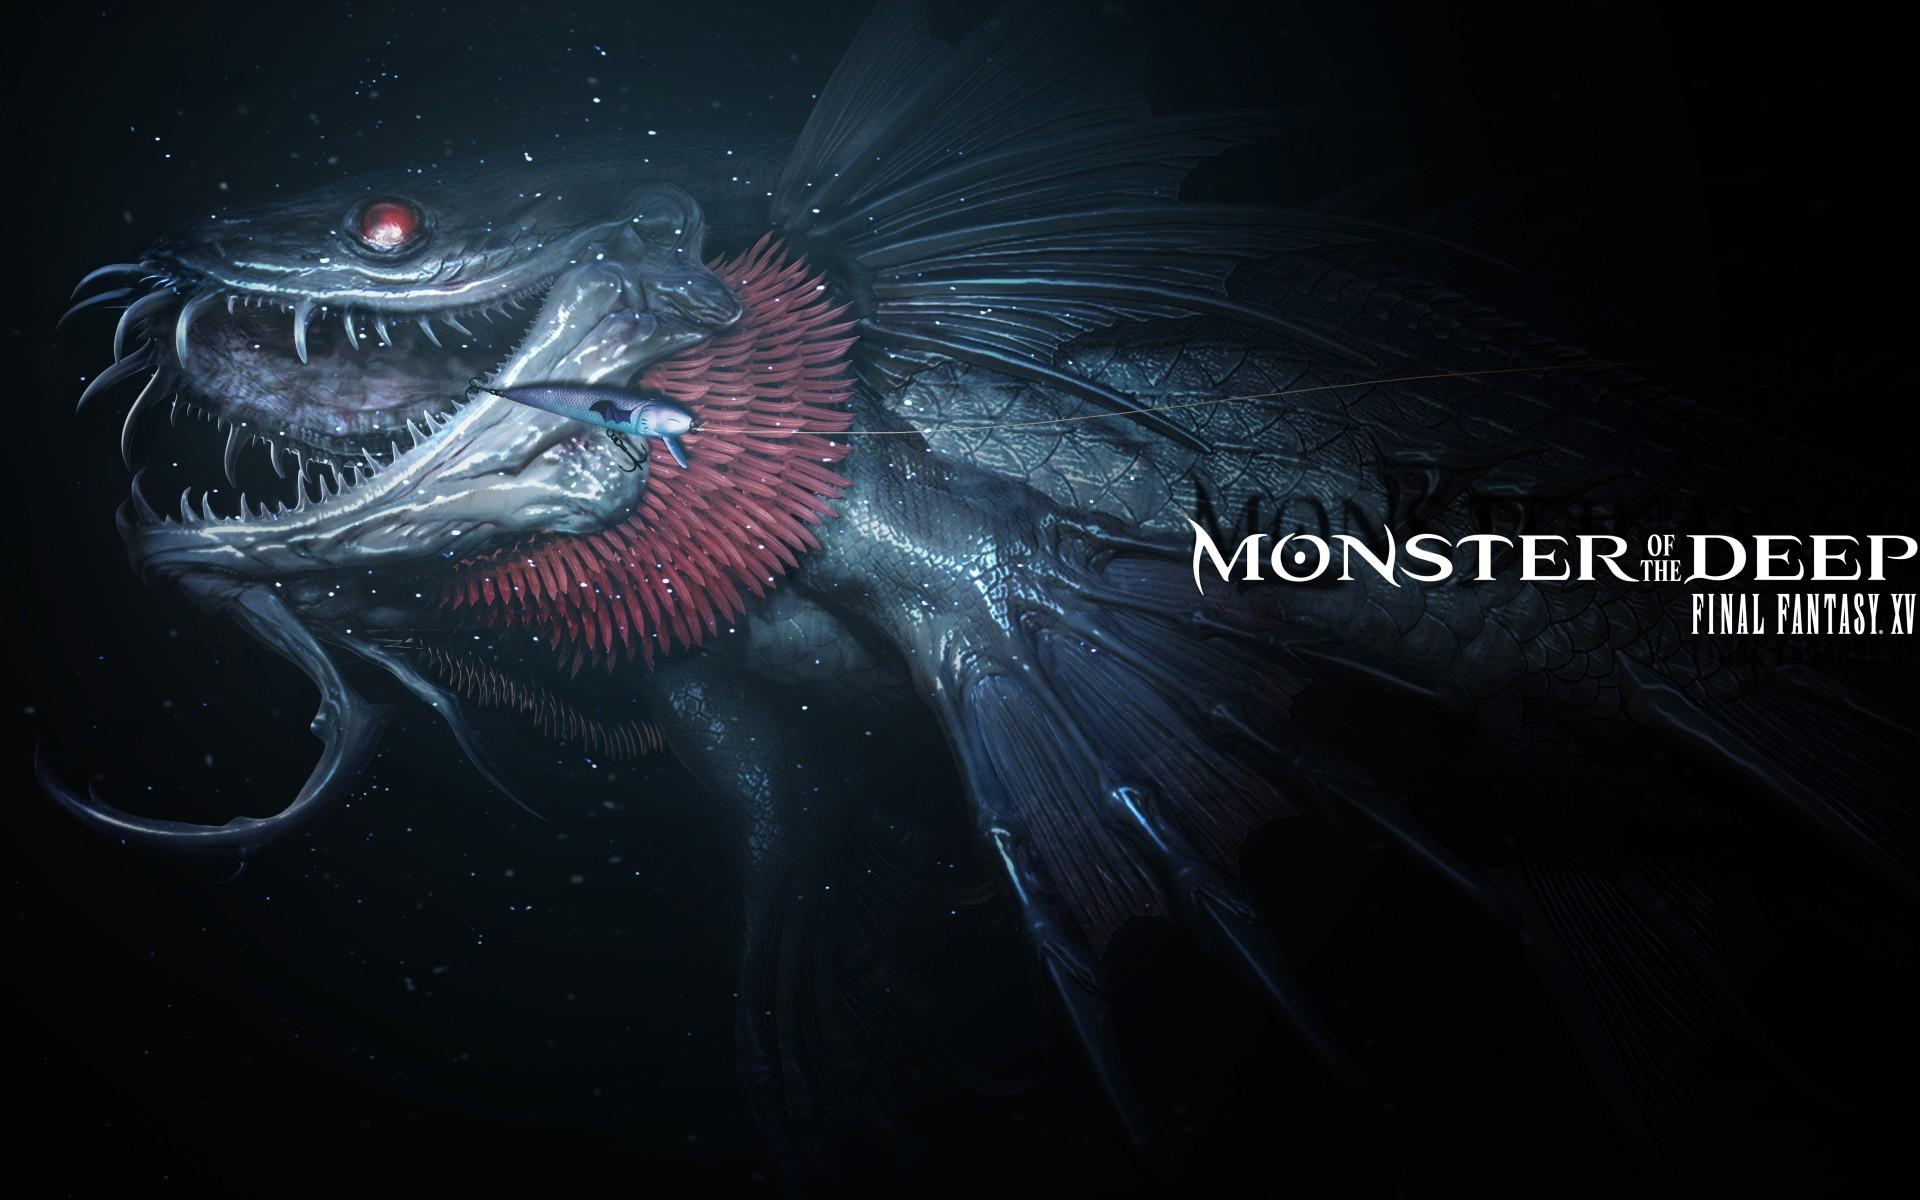 Space / Monster of the Deep: Final Fantasy XV Wallpaper